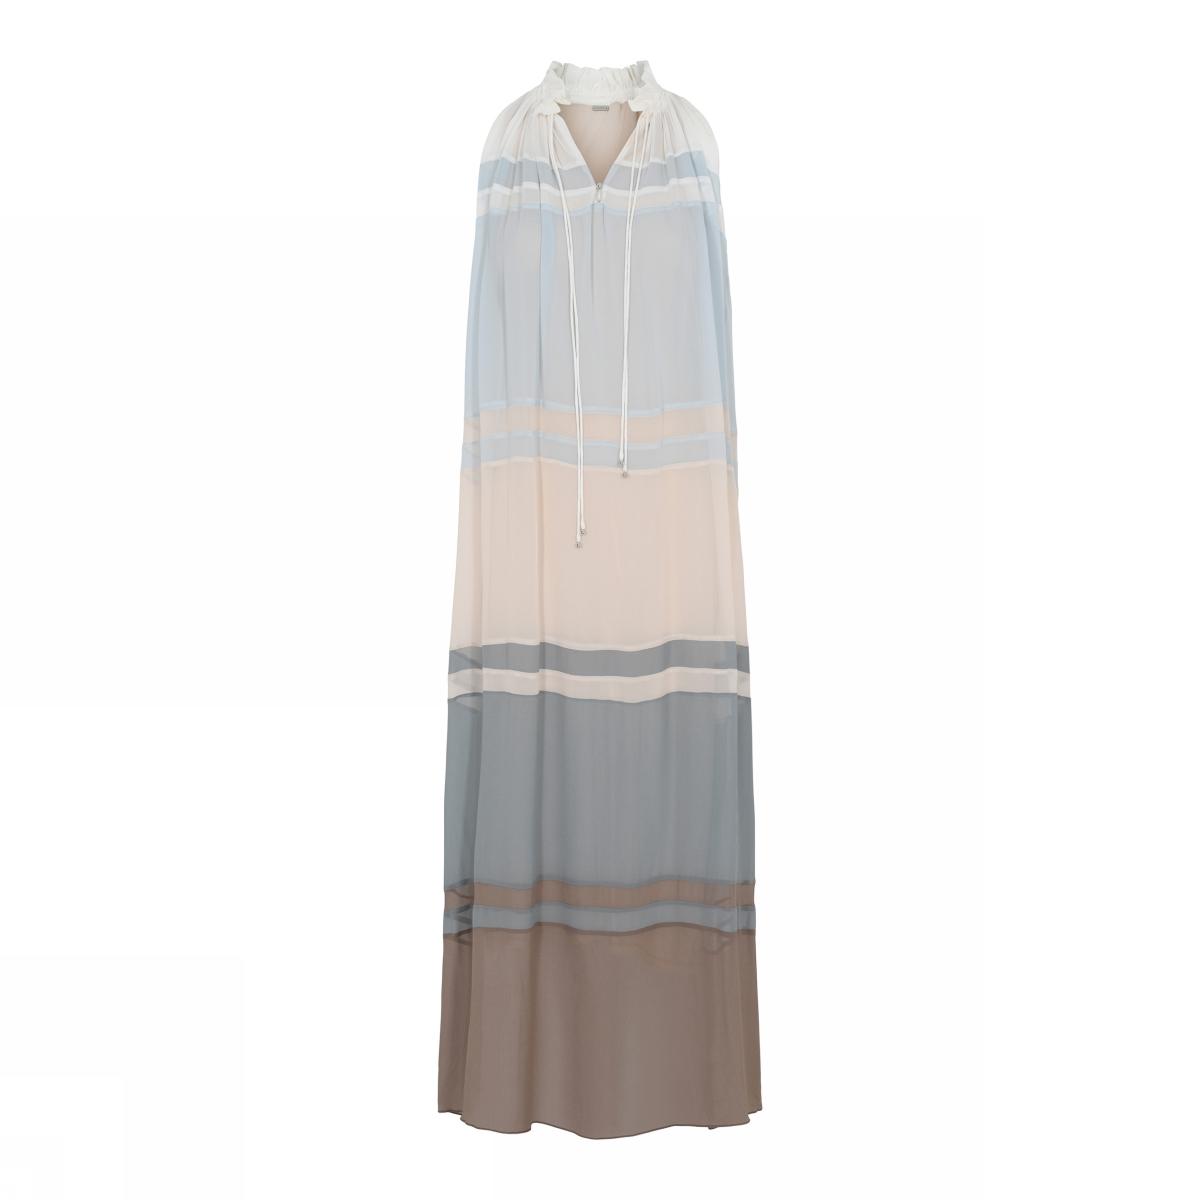 jurk Gustav Alia dress   41515-7355-0-4013